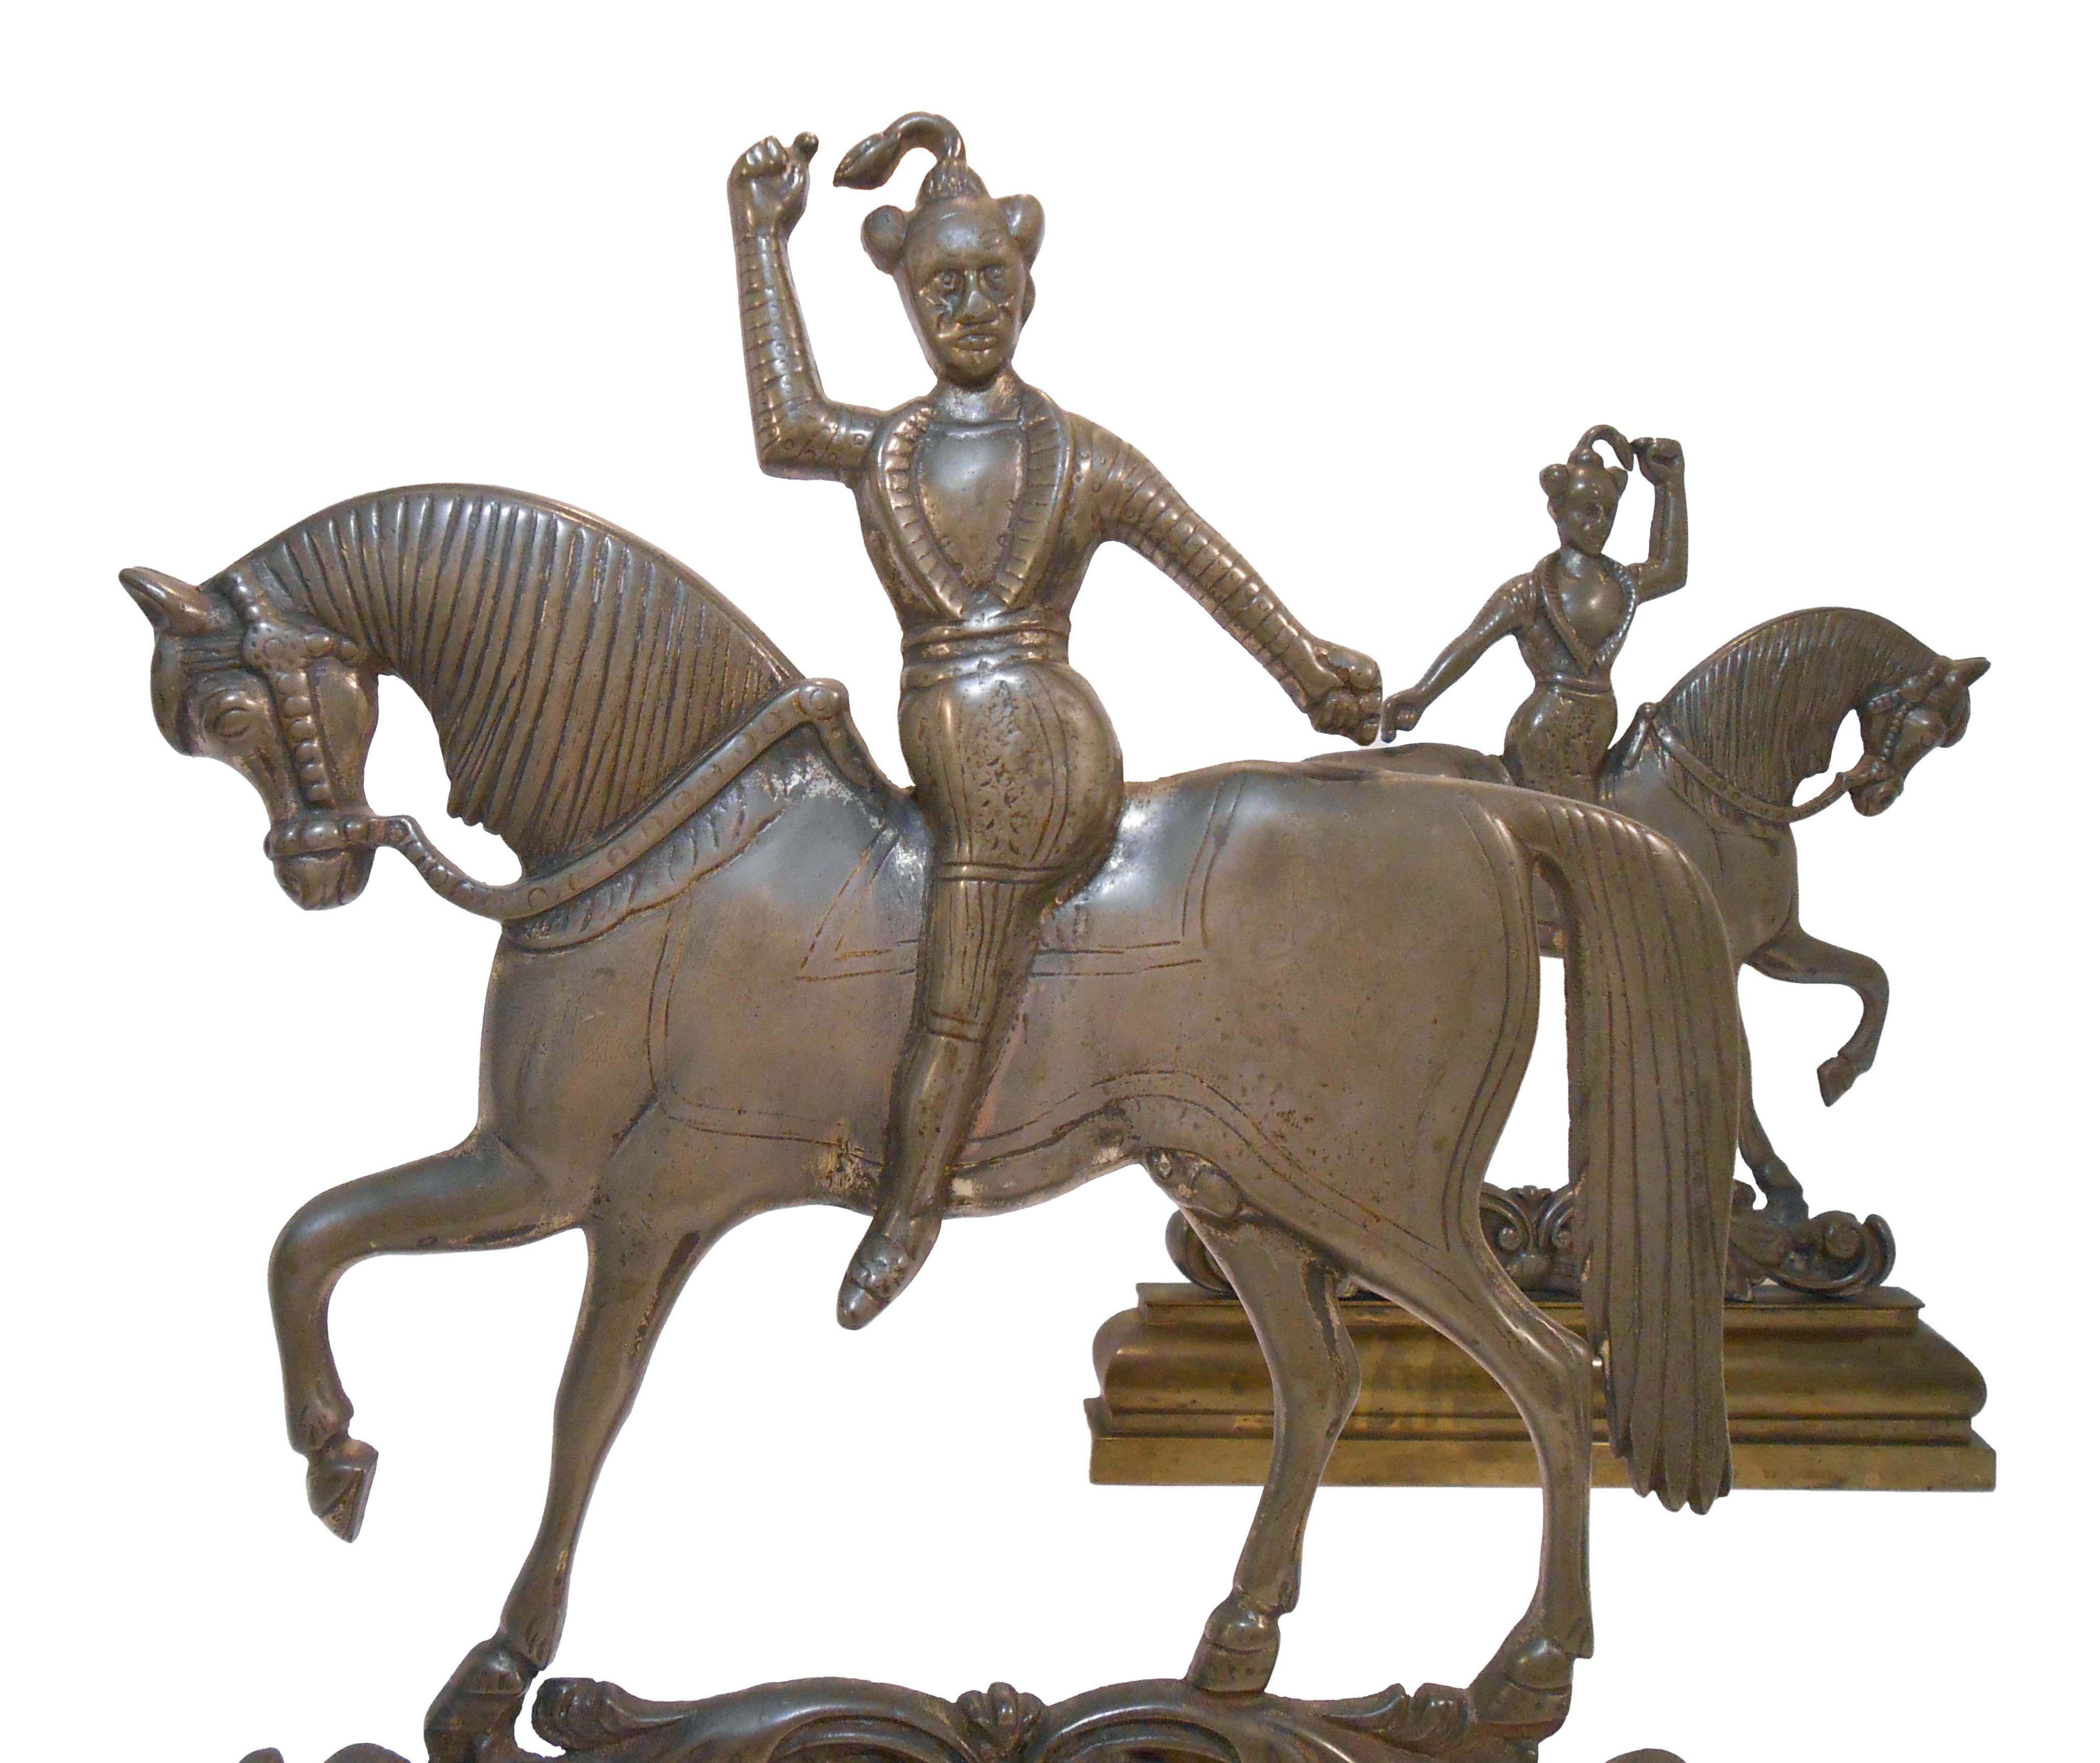 Pin on ꔁஇꕉஜꔭEarly Antiques & Modern Sculpture ꔭஜꕉஇꔁ